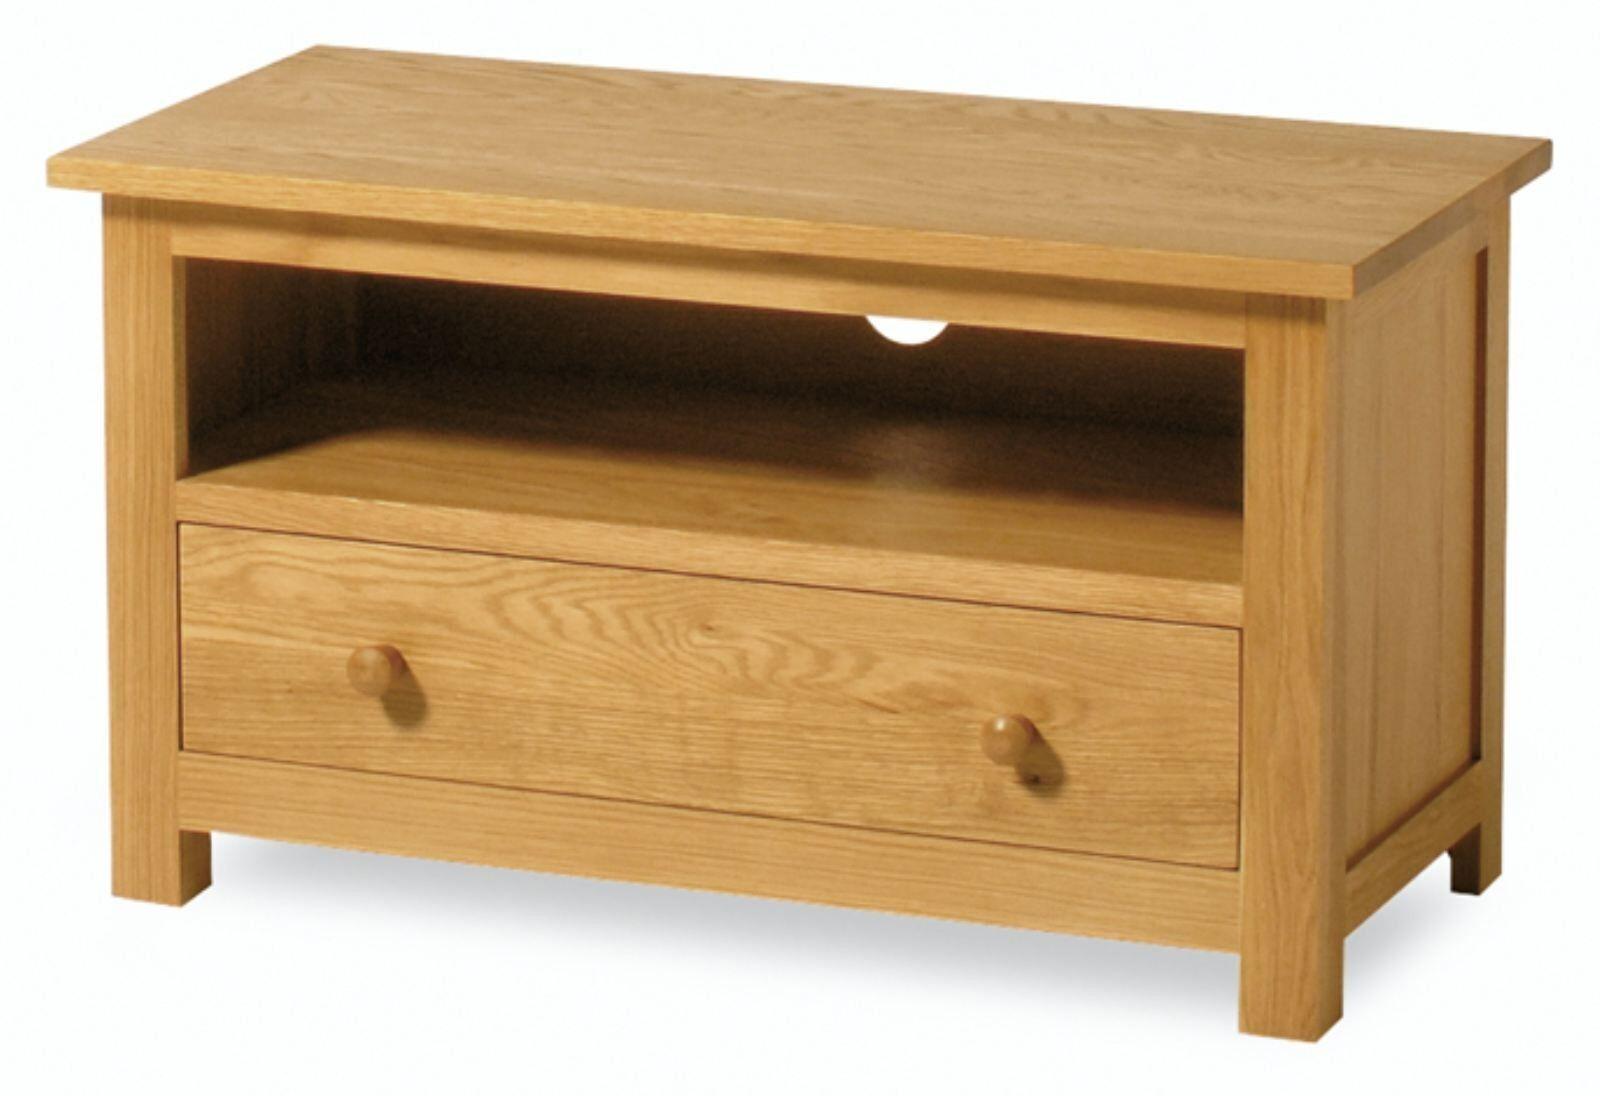 Small Tv Cabinets Penrose Oak Small Tv Stand Modern Light Oak Tv Unit Solid Wood